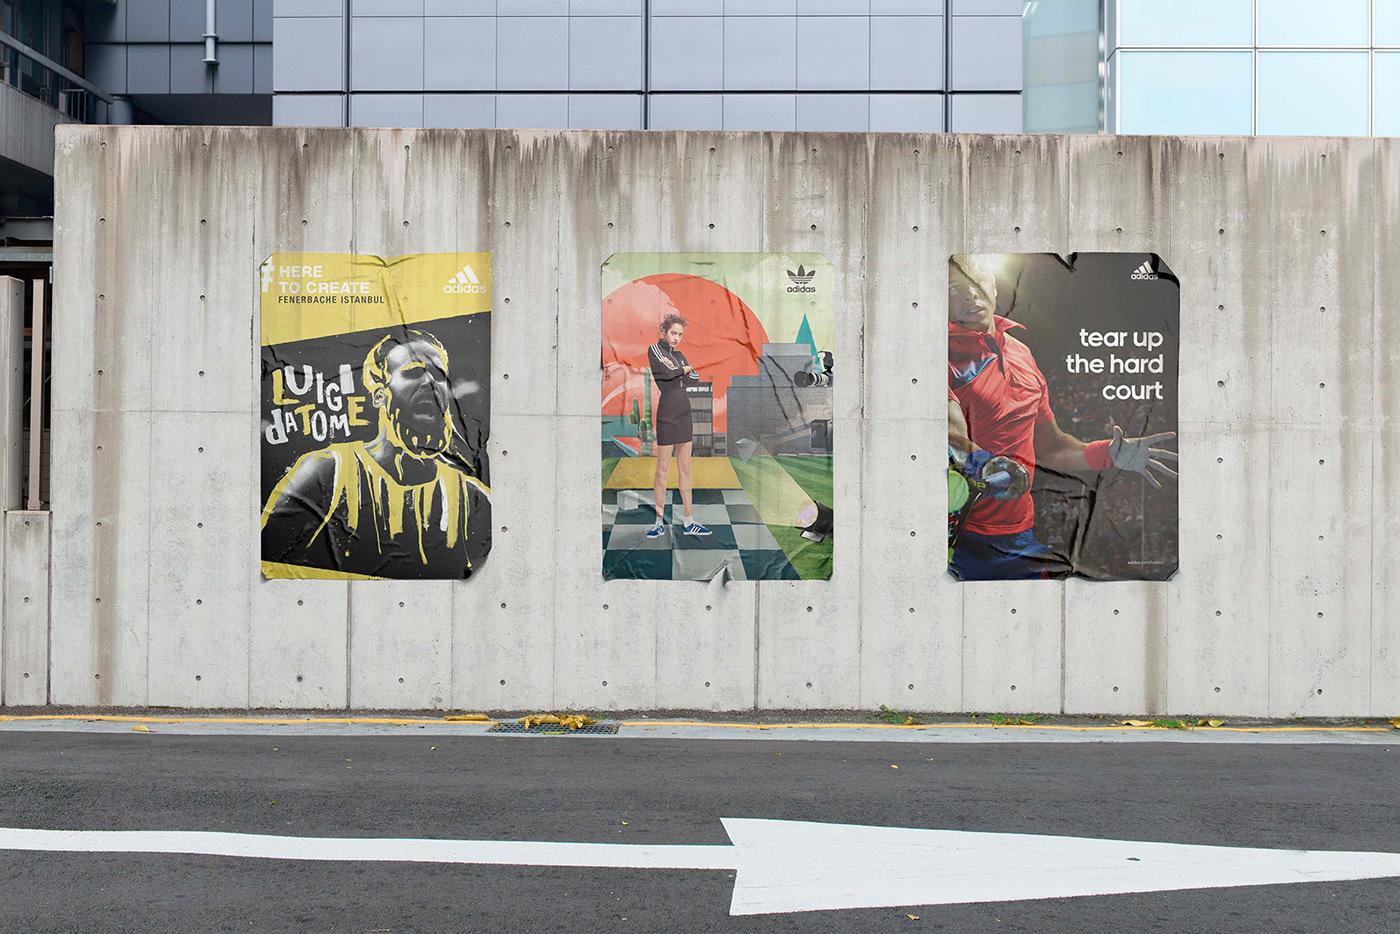 Мокап плаката на стене на улице